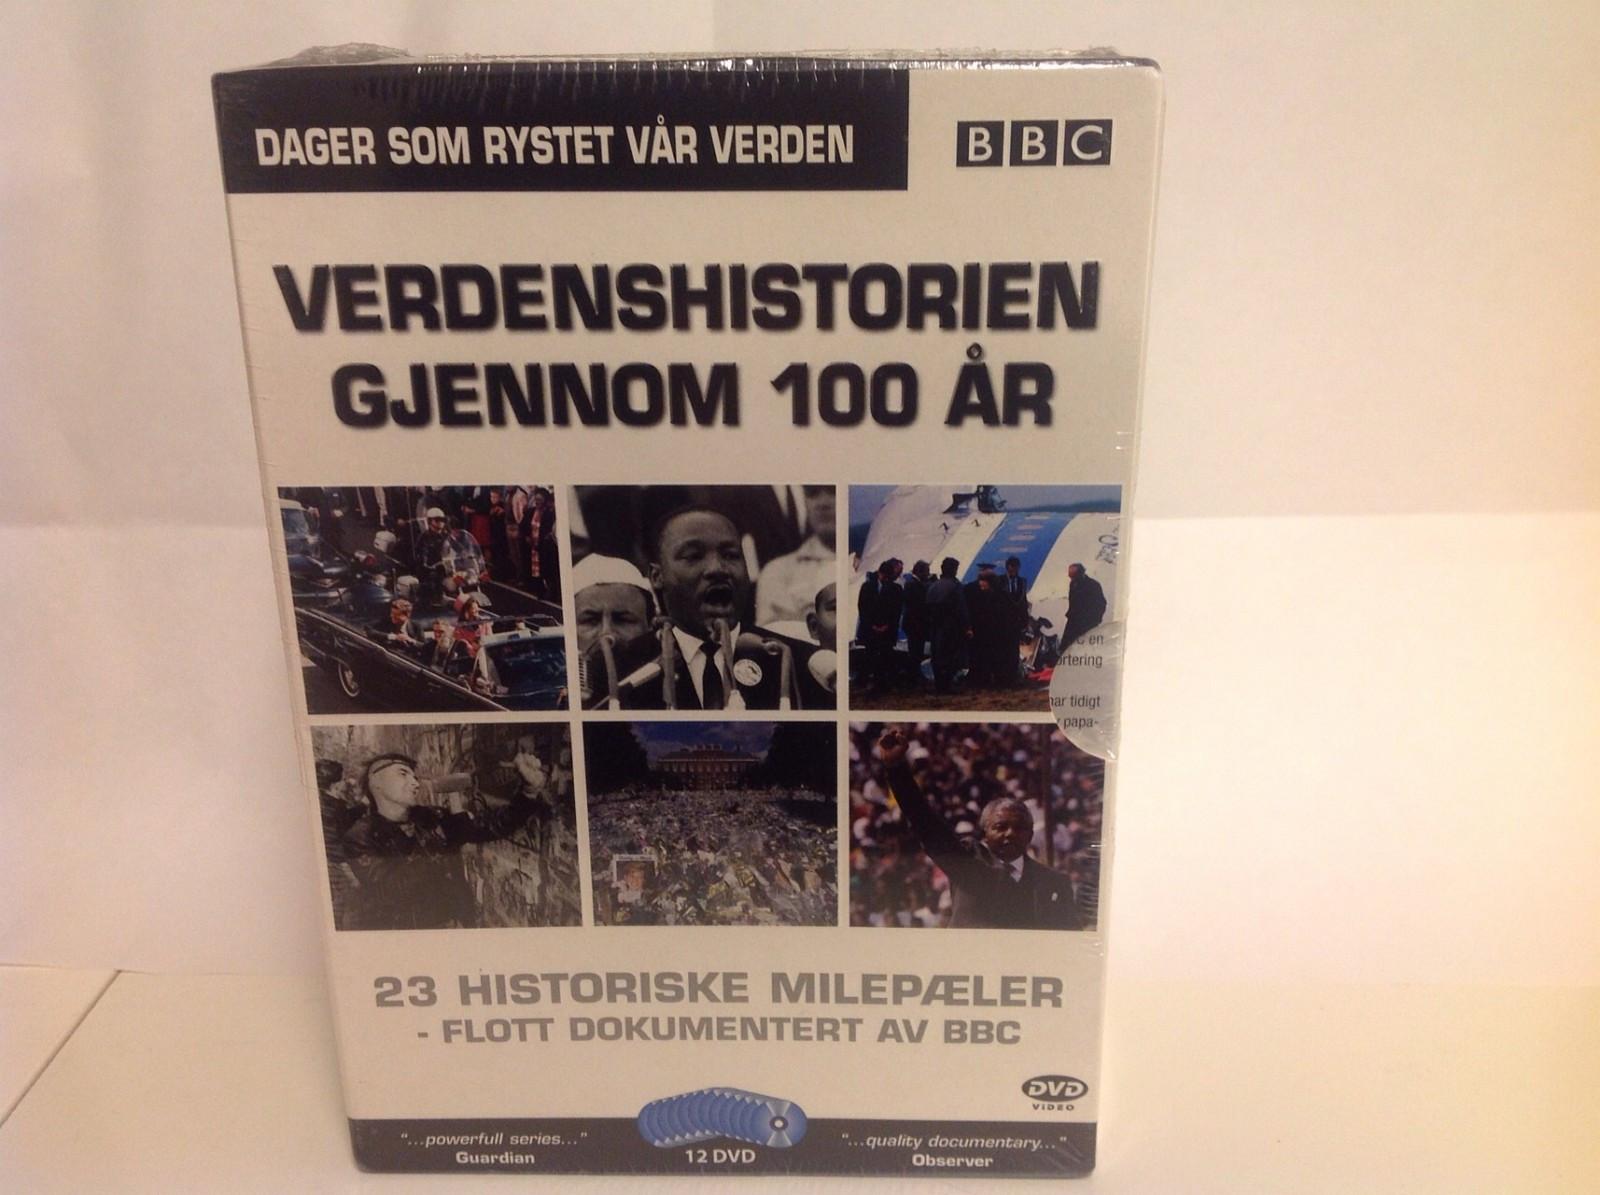 Uåpnet komplett dvd samling om verdenshistorien - Brattholmen  - Ny - Brattholmen